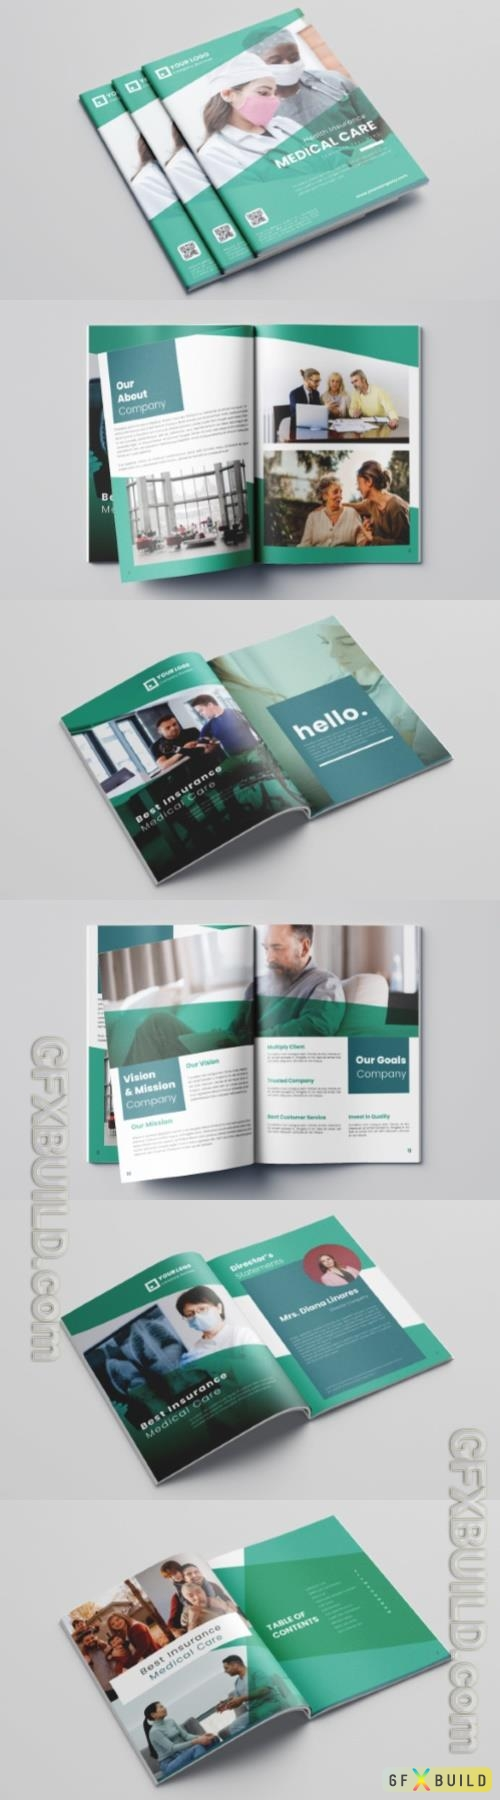 Health Insurance Brochure Vol.3